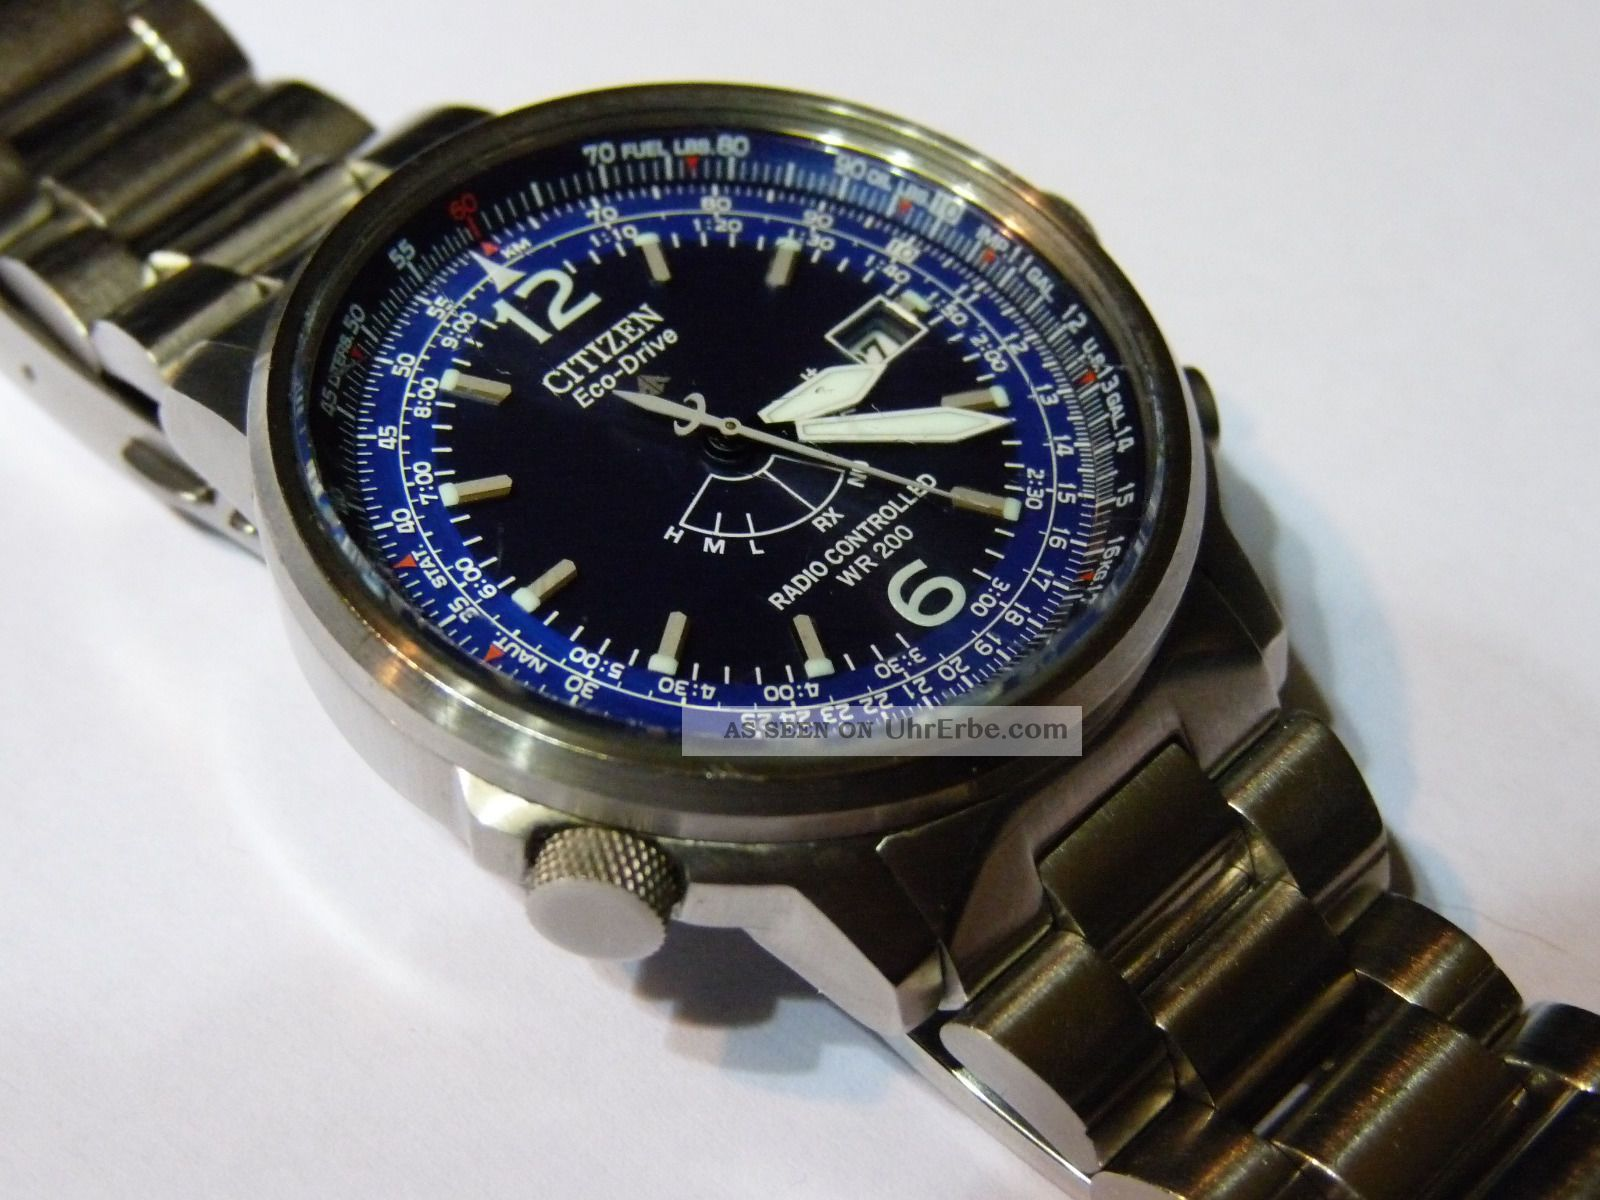 Citizen As 2020 - 53 L Promaster Pilot Eco - Drive Funkuhr Armbanduhren Bild